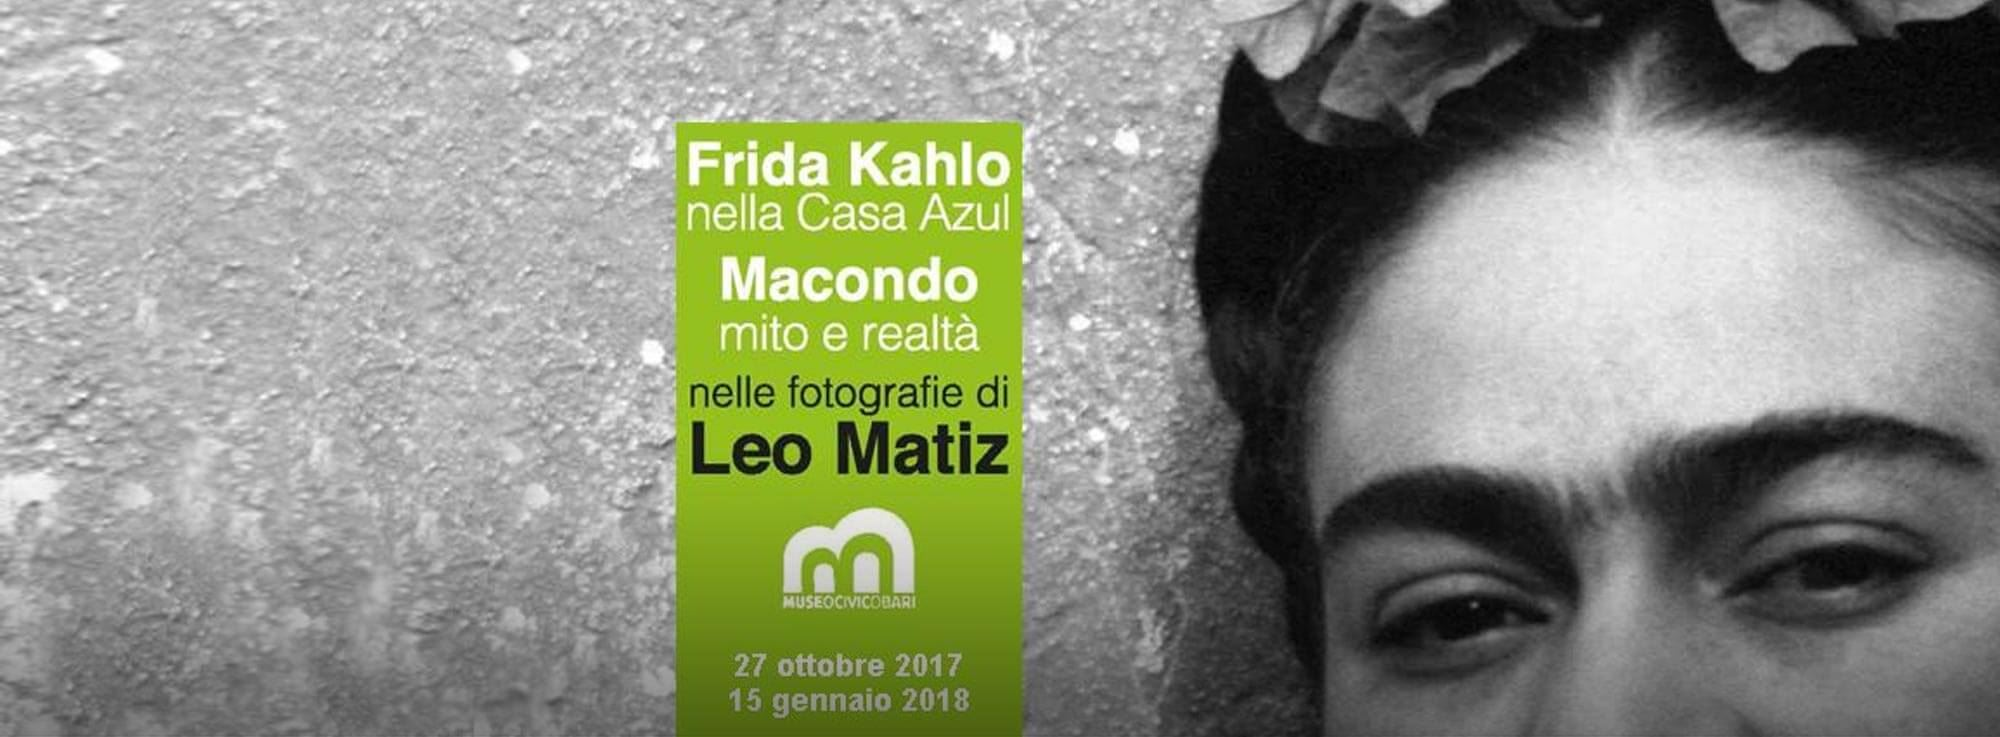 Bari: Frida Kahlo nella Casa Azul-Macondo